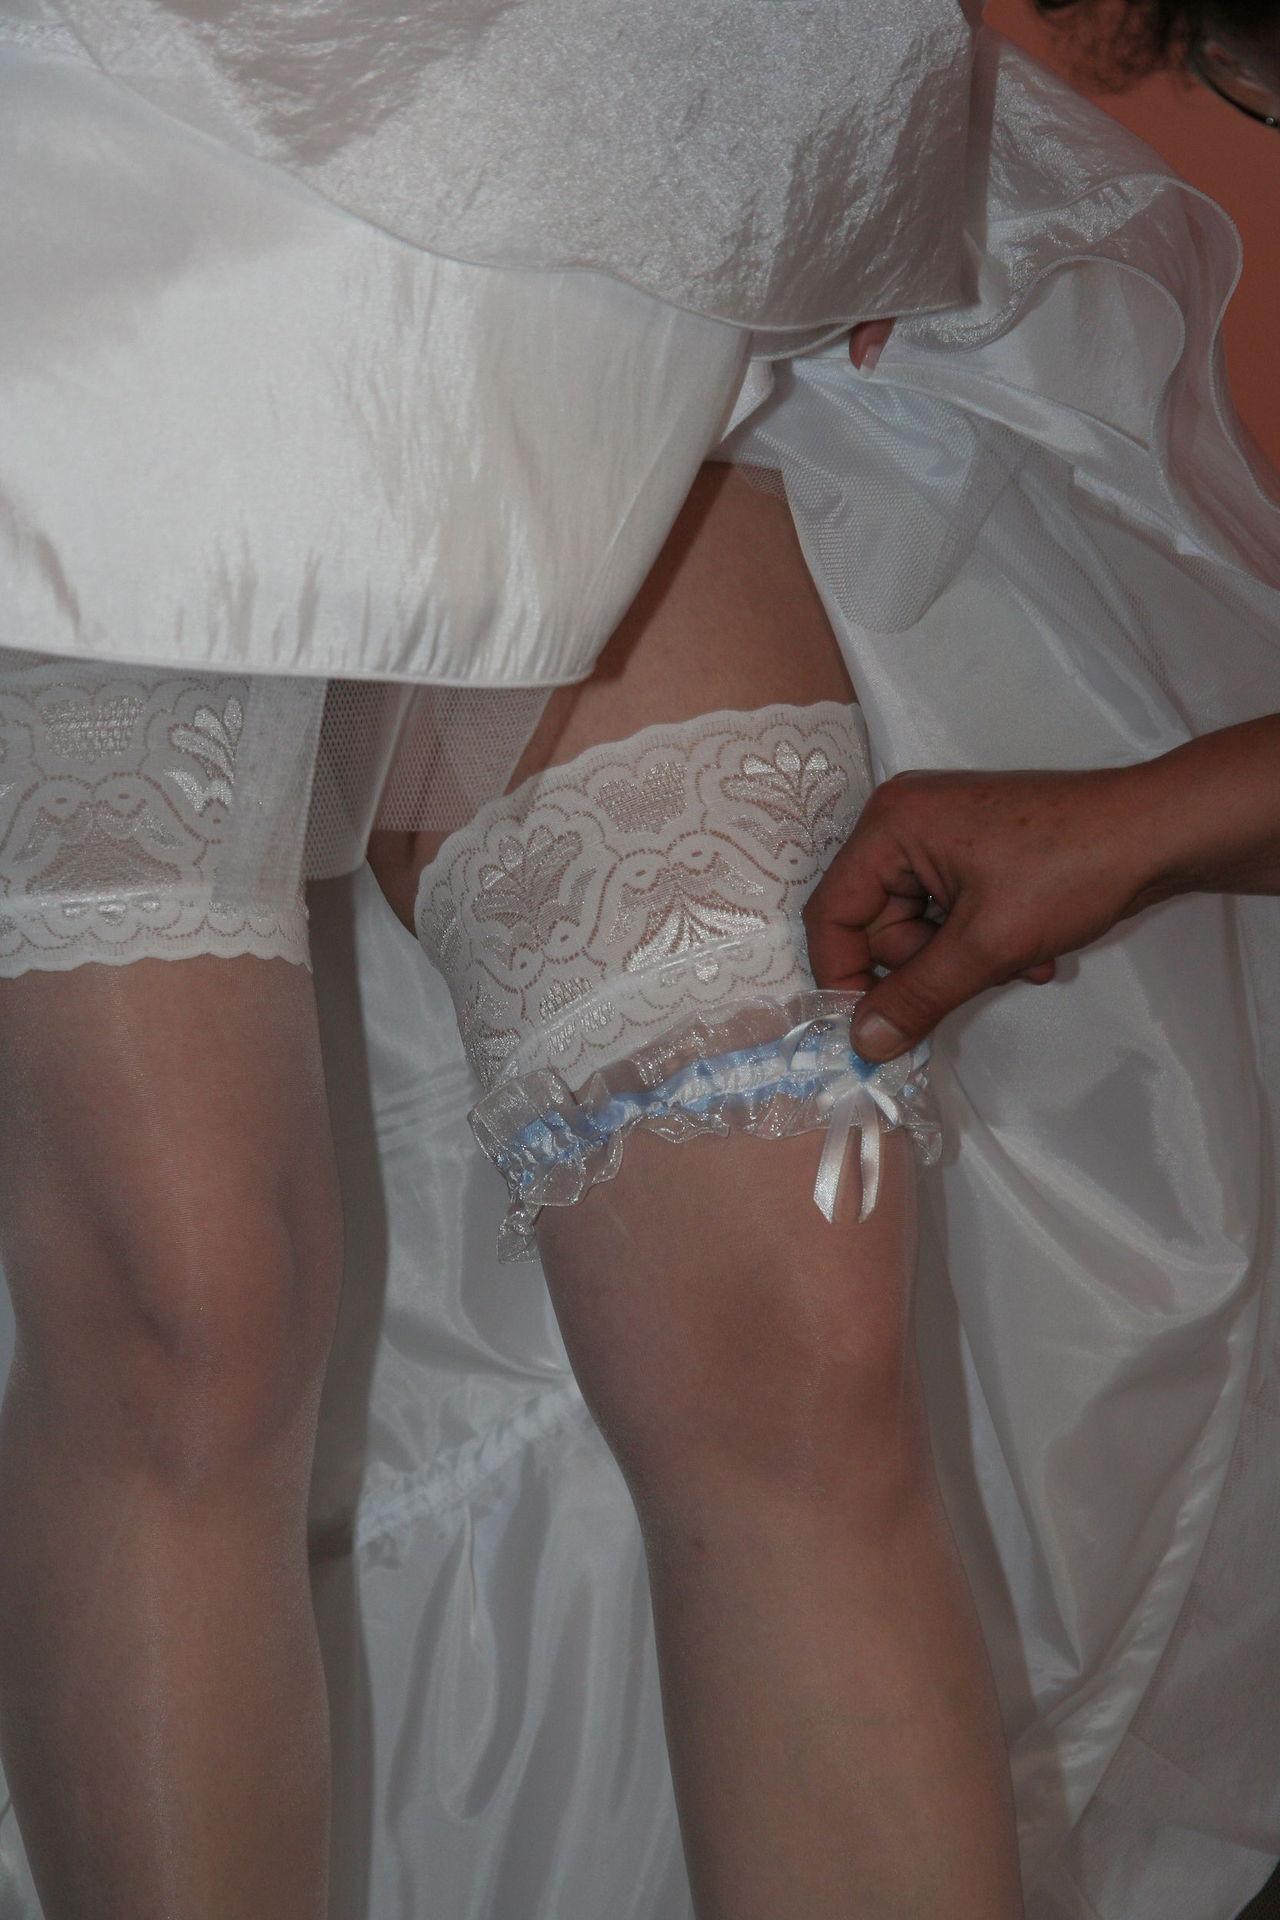 https://voyeurpapa.com/wp-content/uploads/2016/12/Wedding-skandall-SEXY-and-NUDE-598.jpg